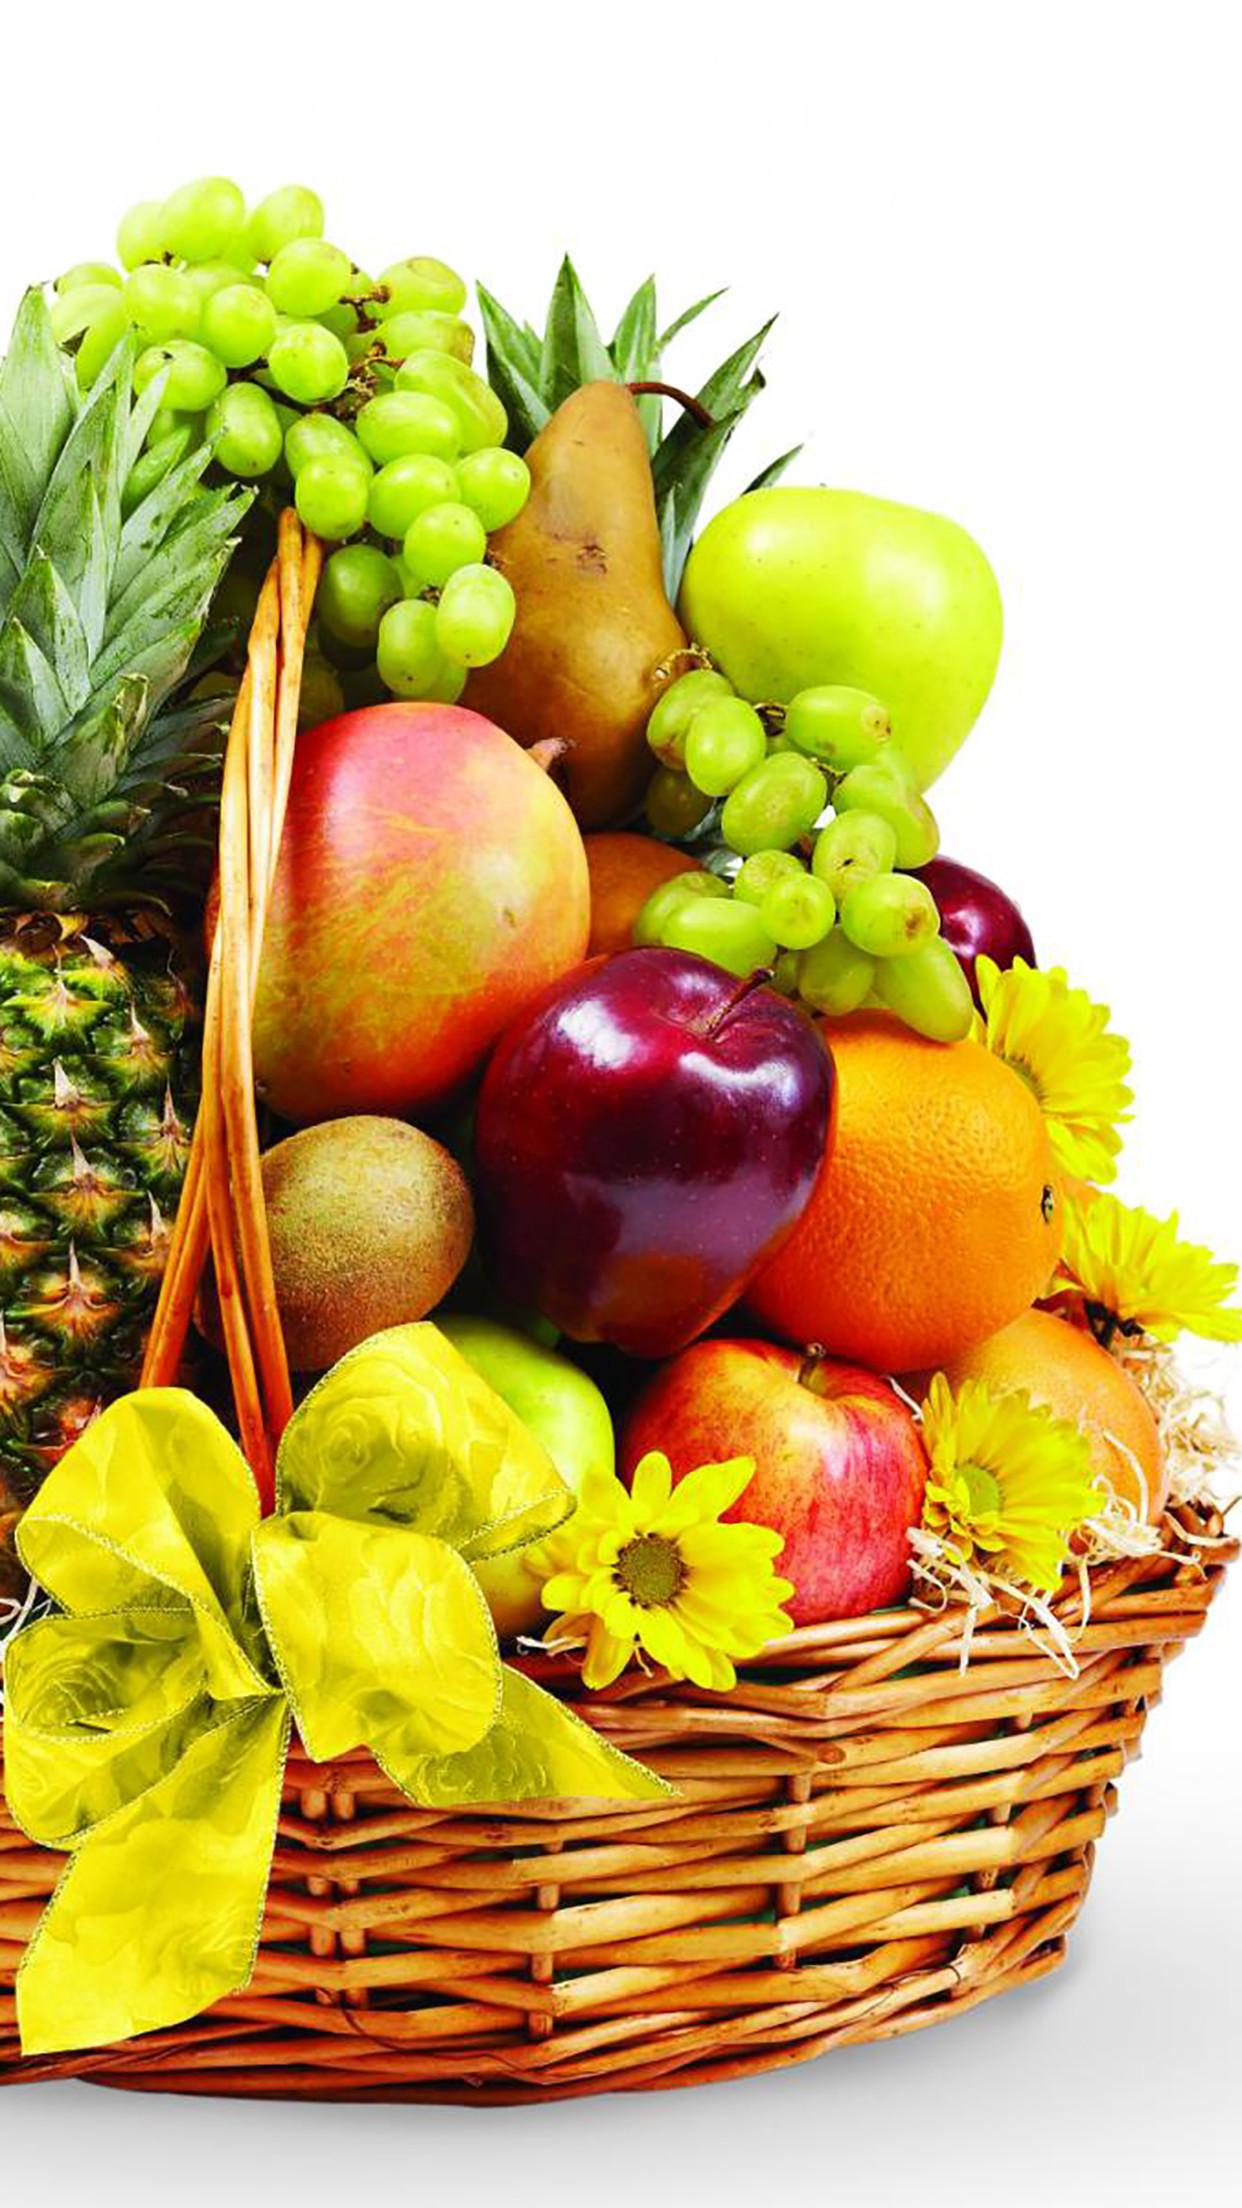 Res: 1242x2208, Fruit Fruits Basket 3Wallpapers iPhone Parallax Fruits : Basket fruit